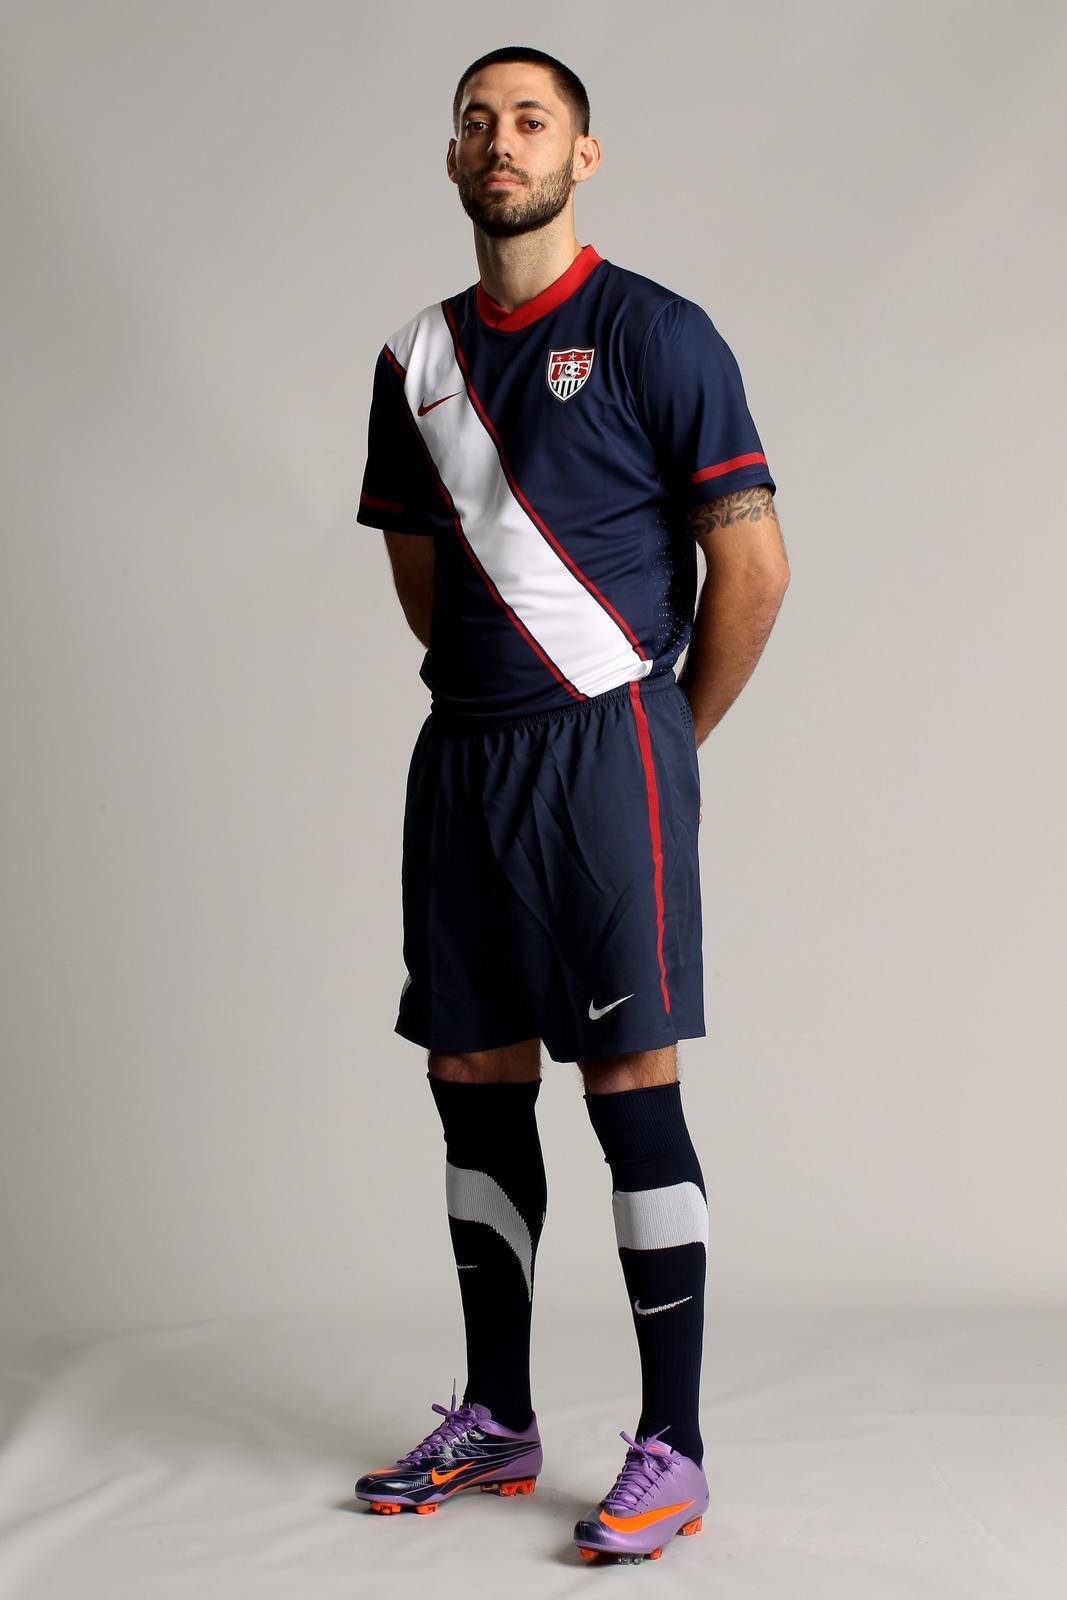 Nike Introduces 2010 National Team Kits - Nike News